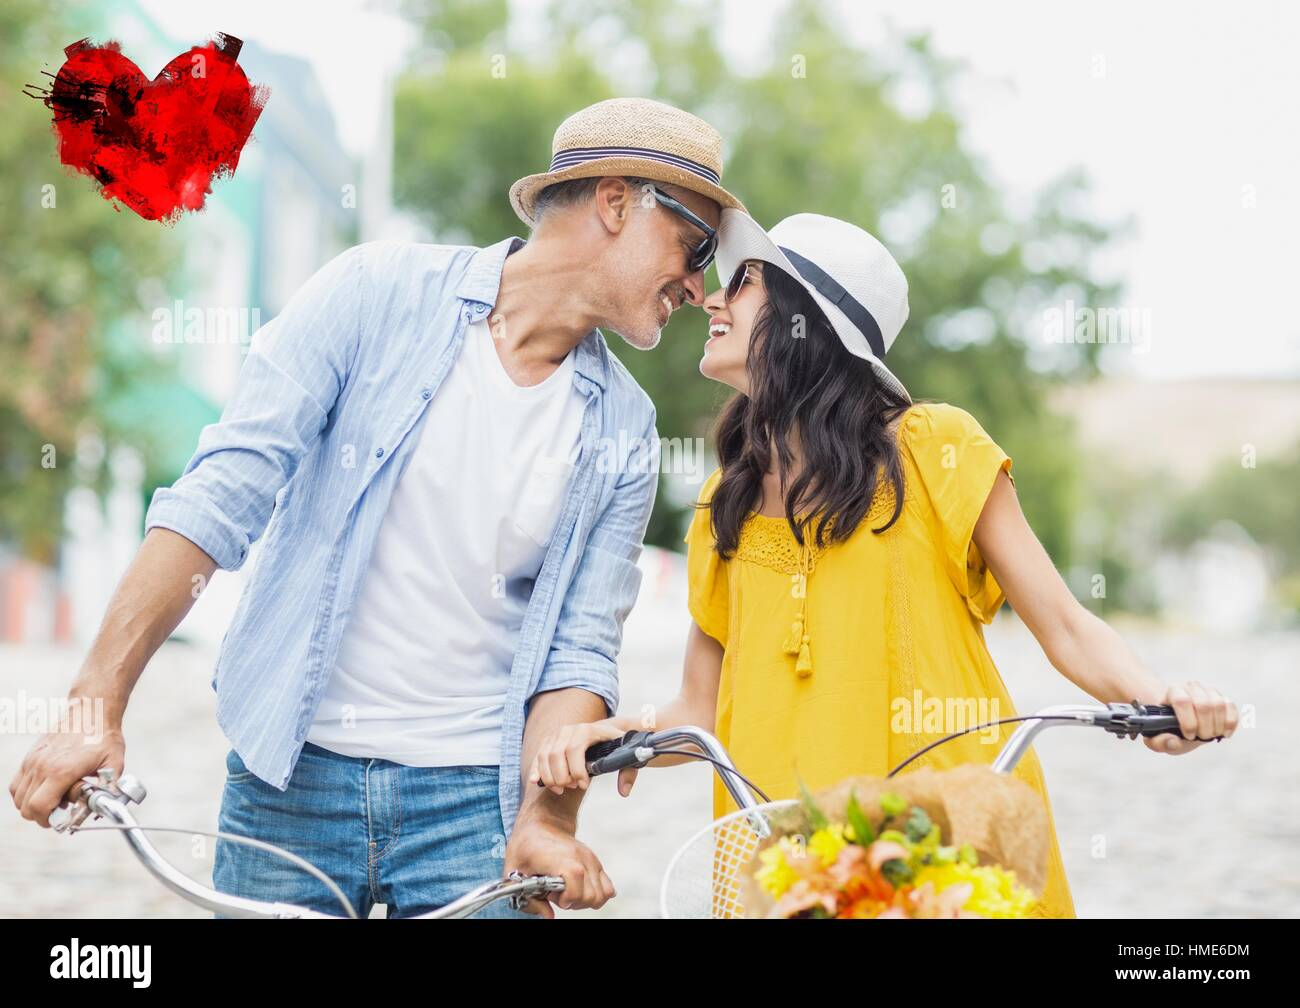 Romantic couple having fun - Stock Image